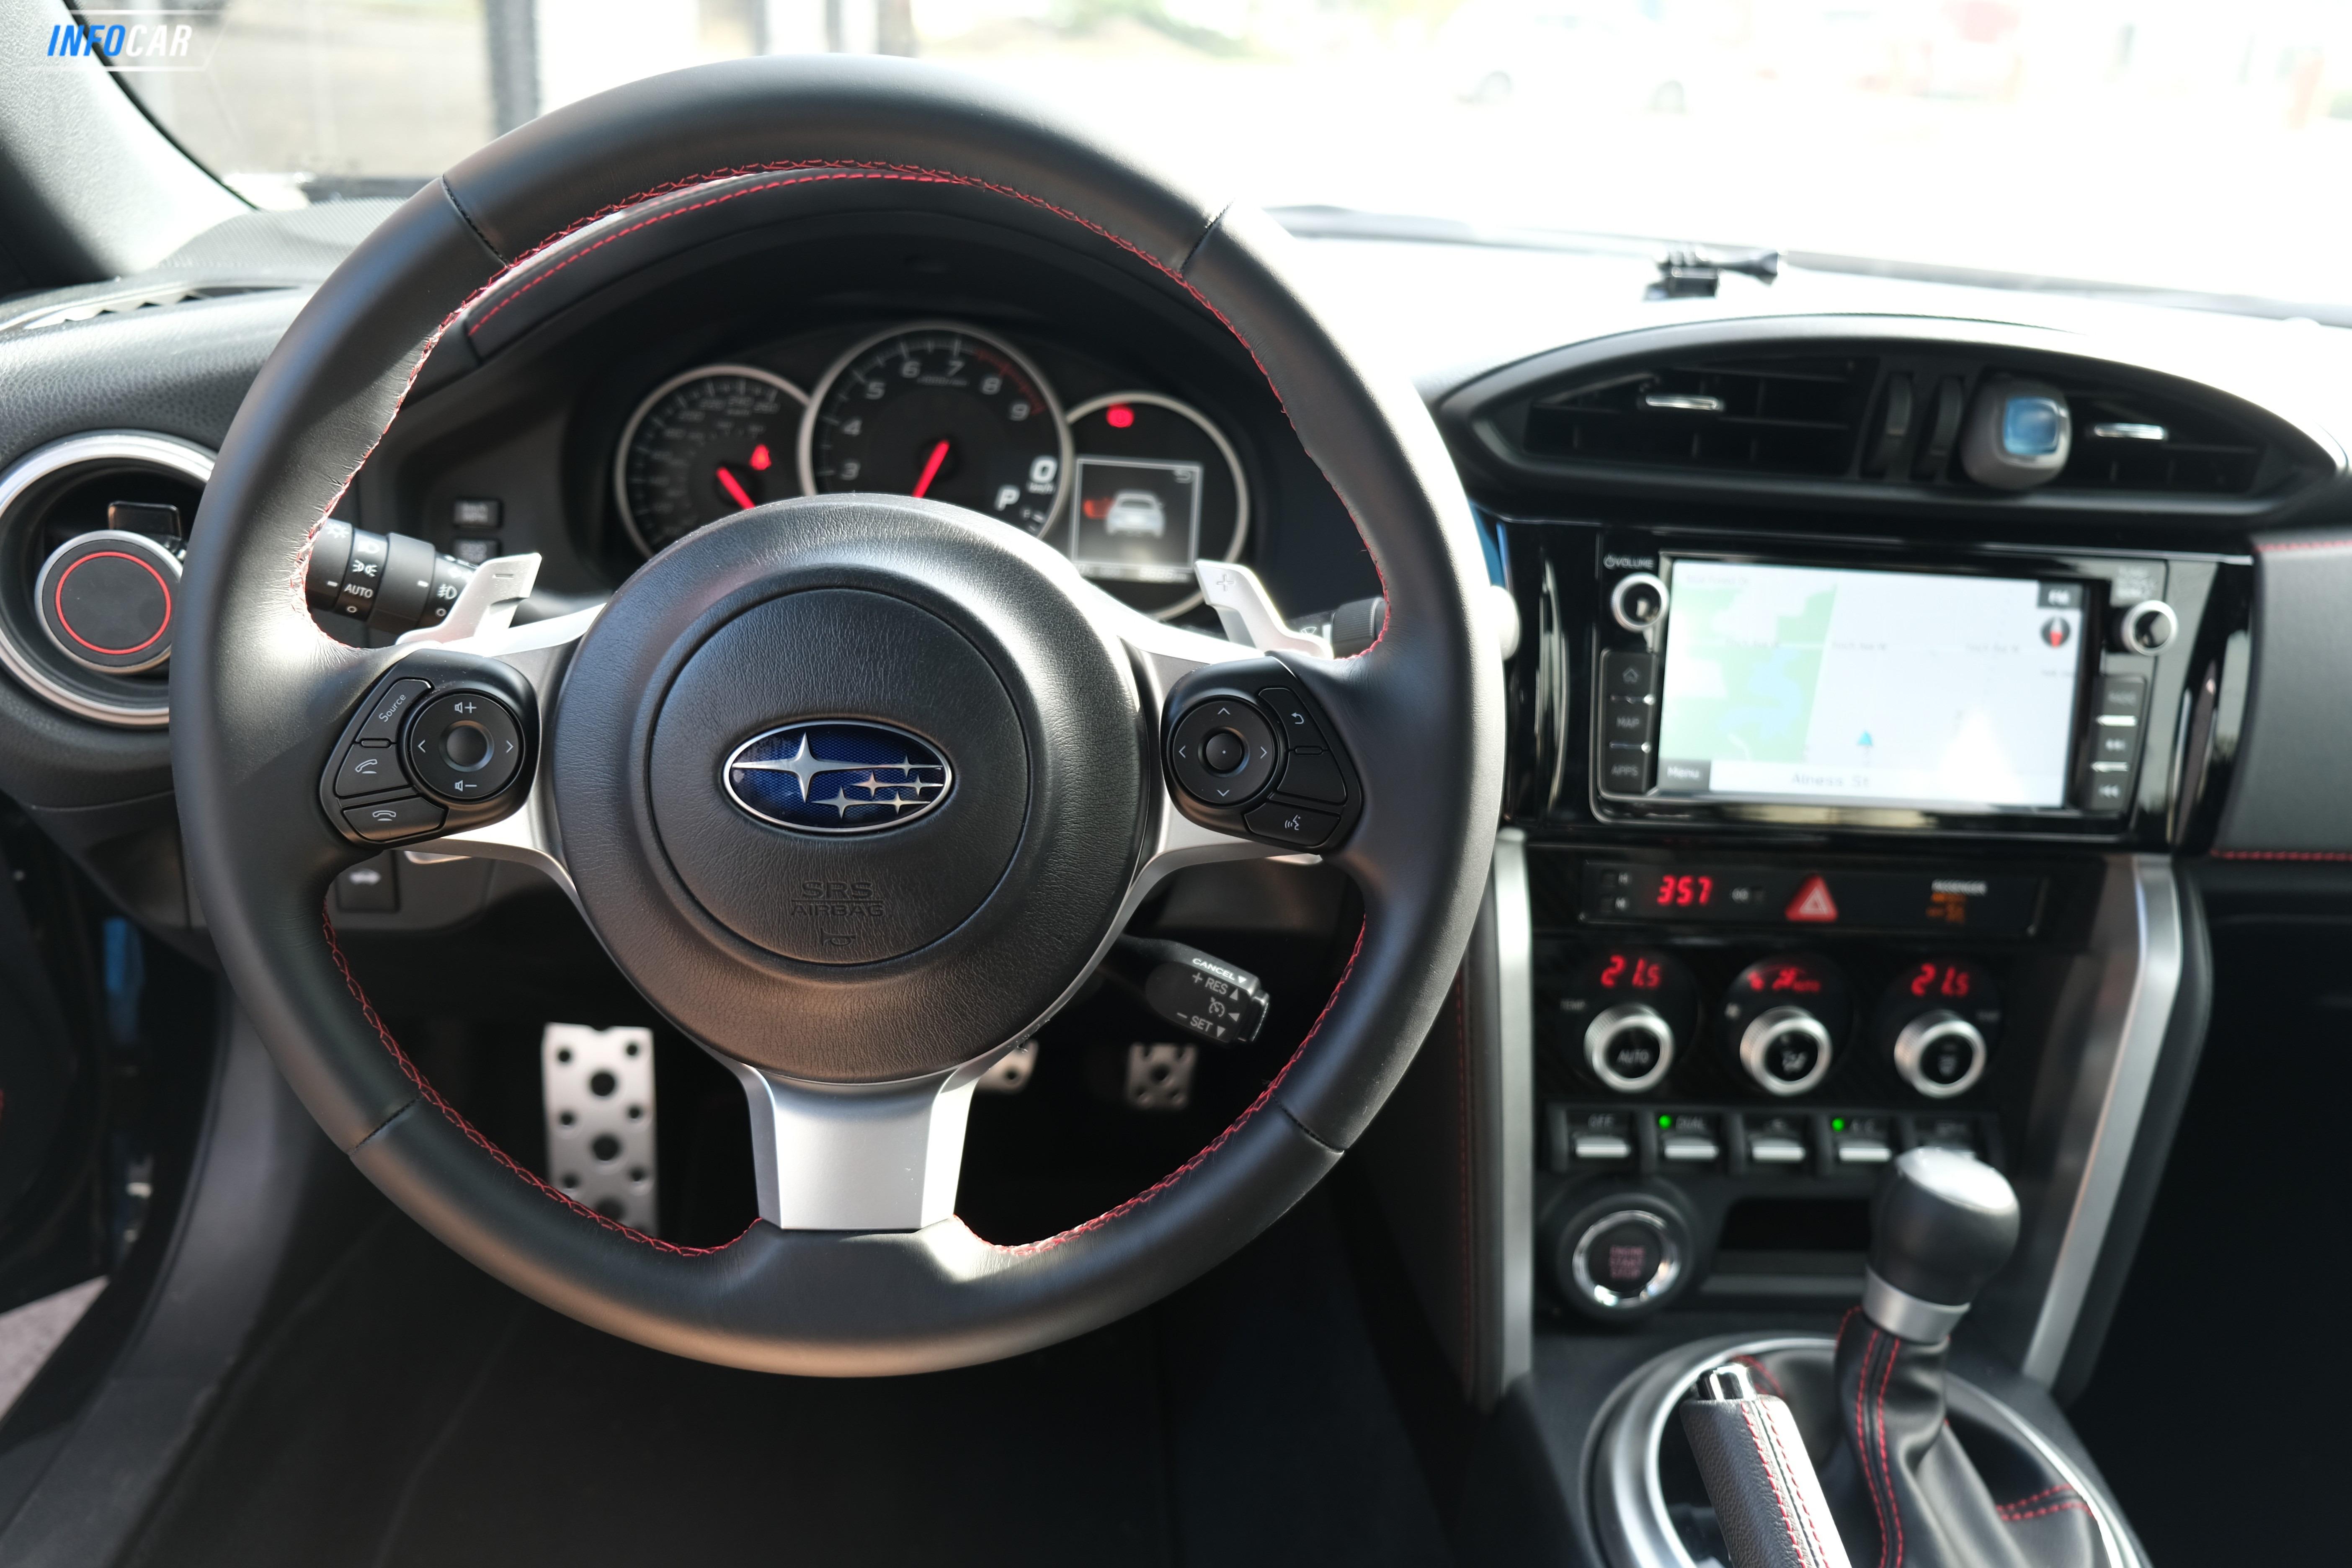 2020 Subaru BRZ SPORT TECH AT - INFOCAR - Toronto's Most Comprehensive New and Used Auto Trading Platform